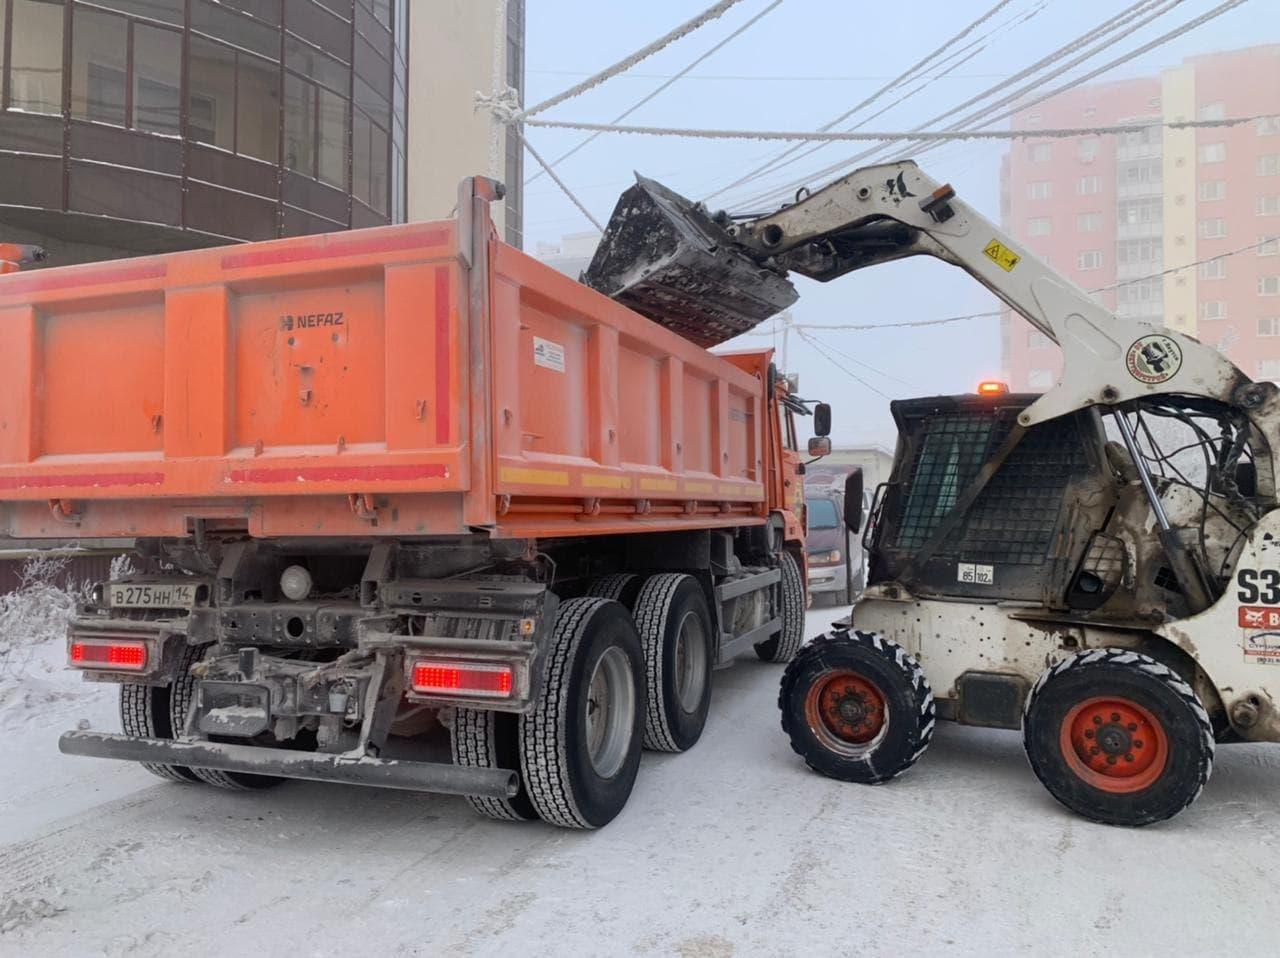 «Якутдорстрой»: снегоуборка идет с опережением графика на два дня